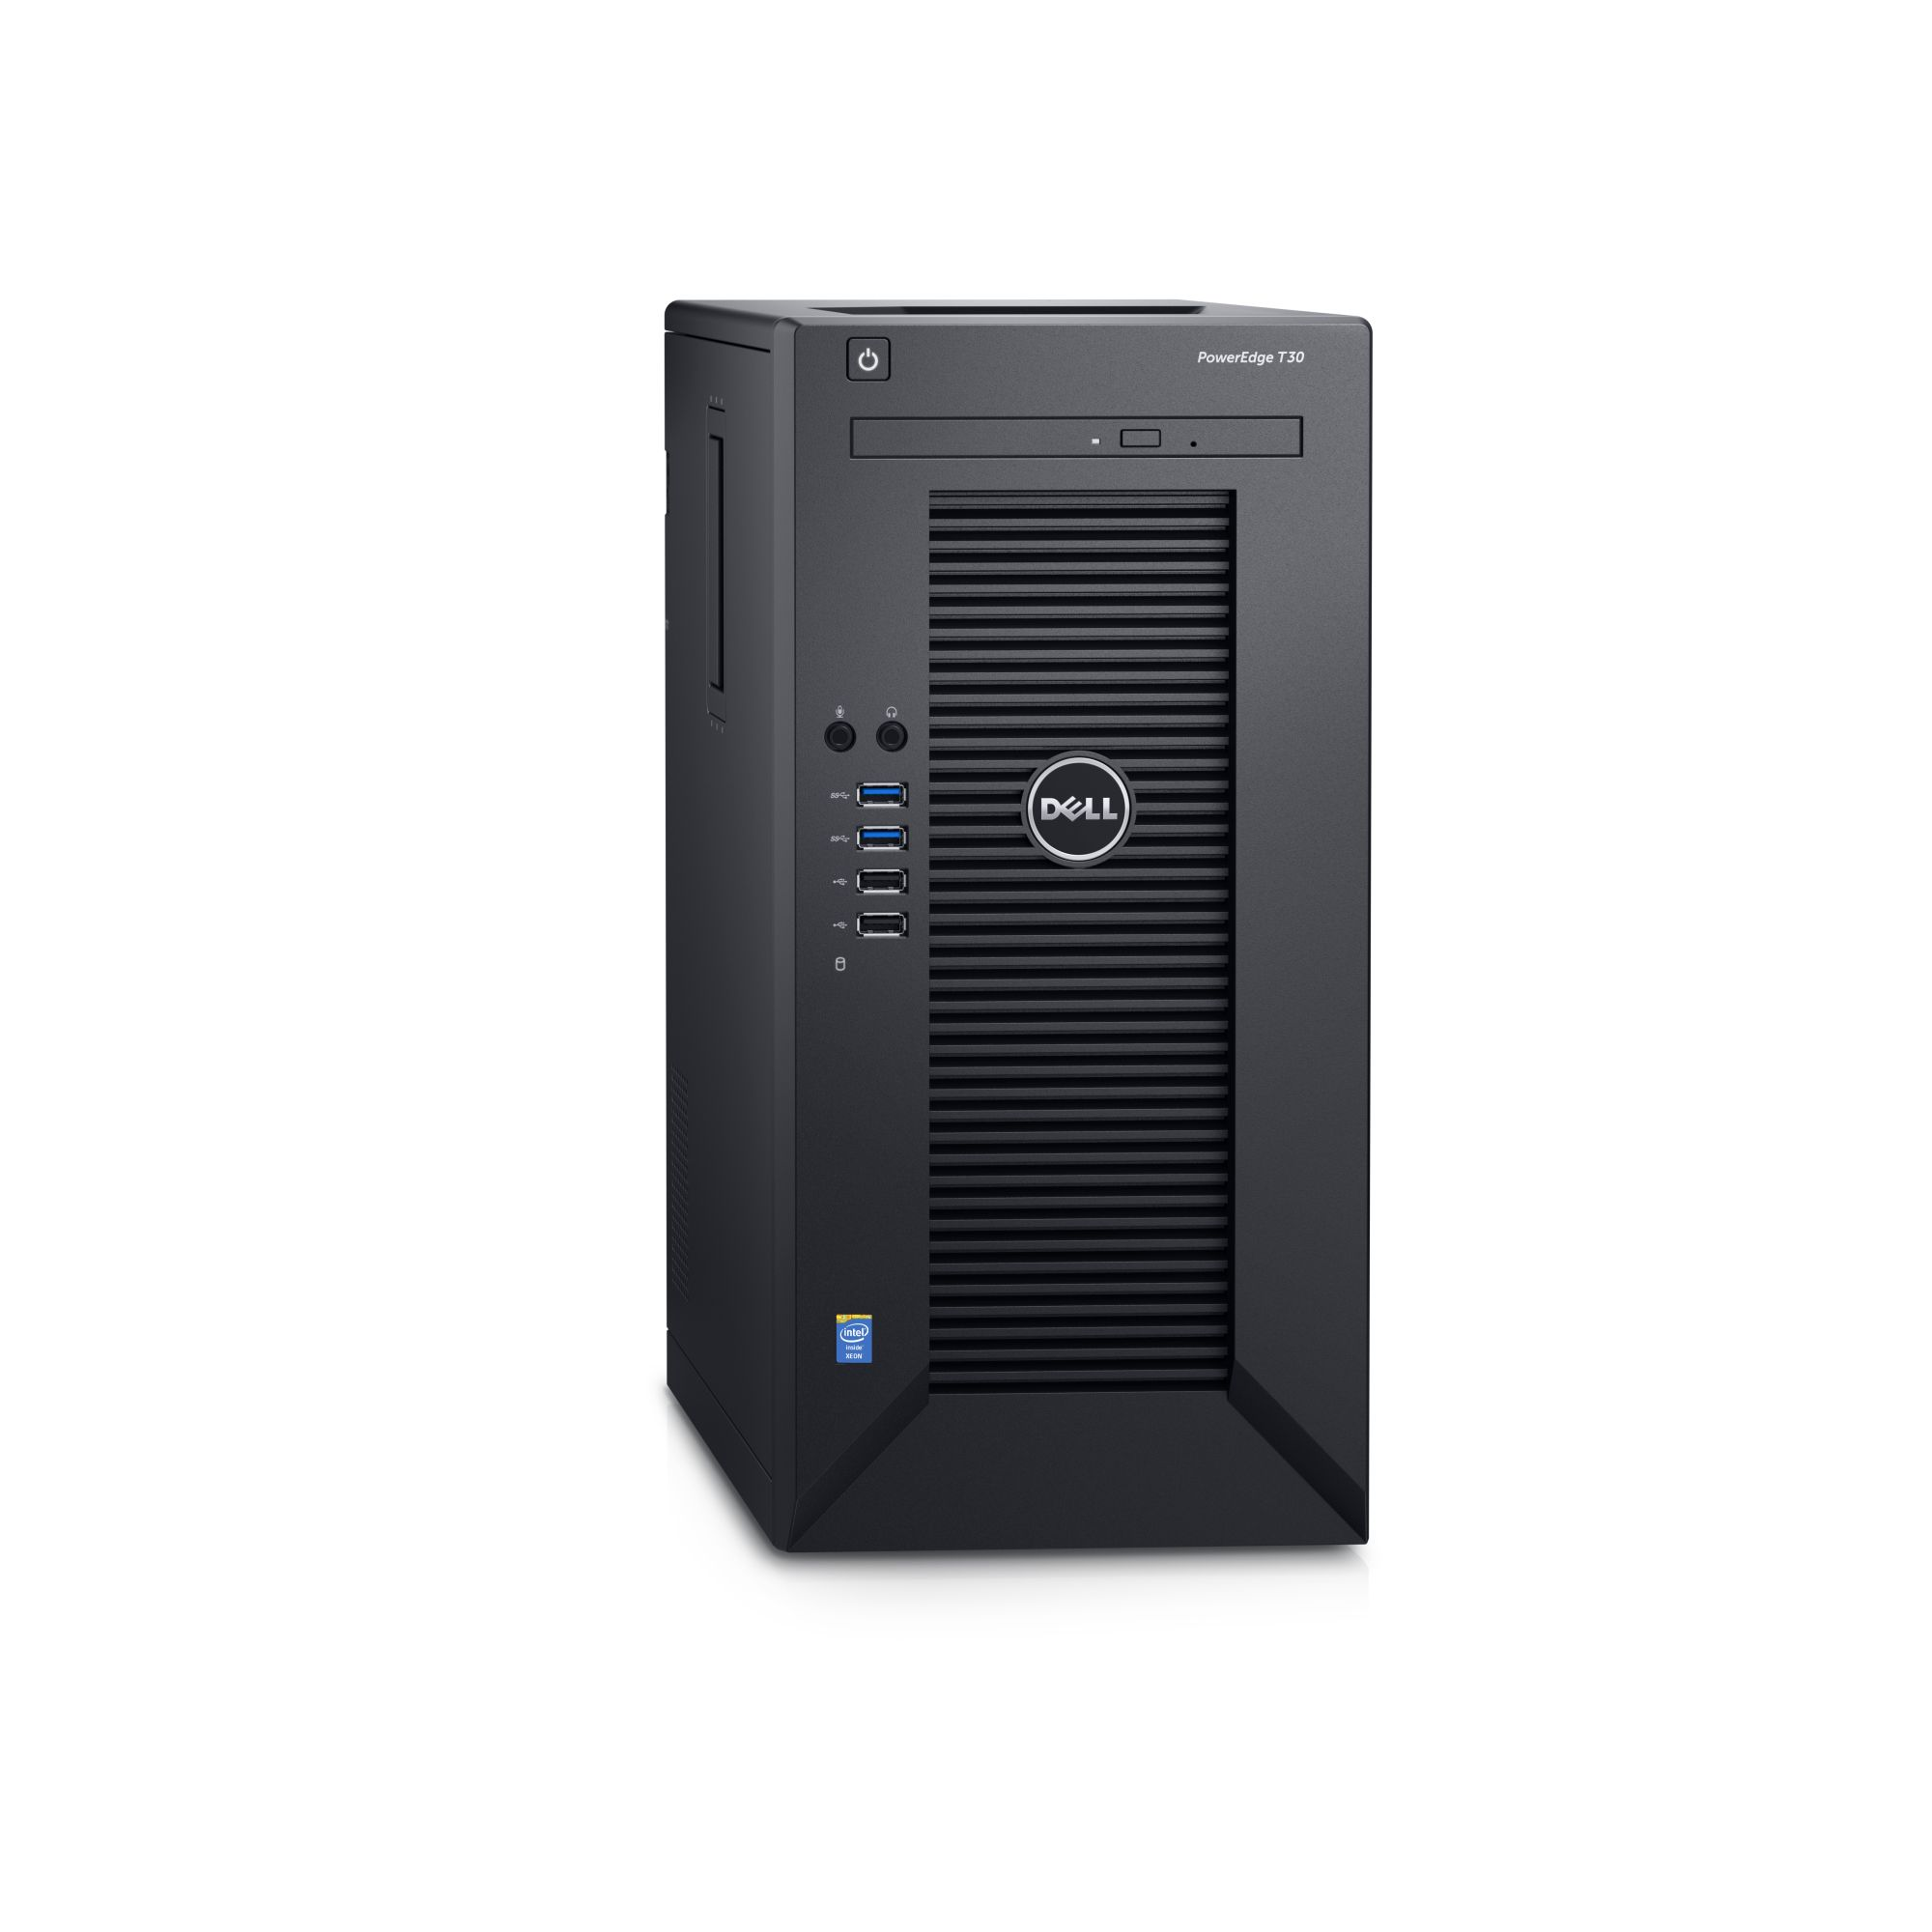 DELL PE T30/E3-1225v5/8GB/2x1TB SATA/DRW/1xGL/1x290W